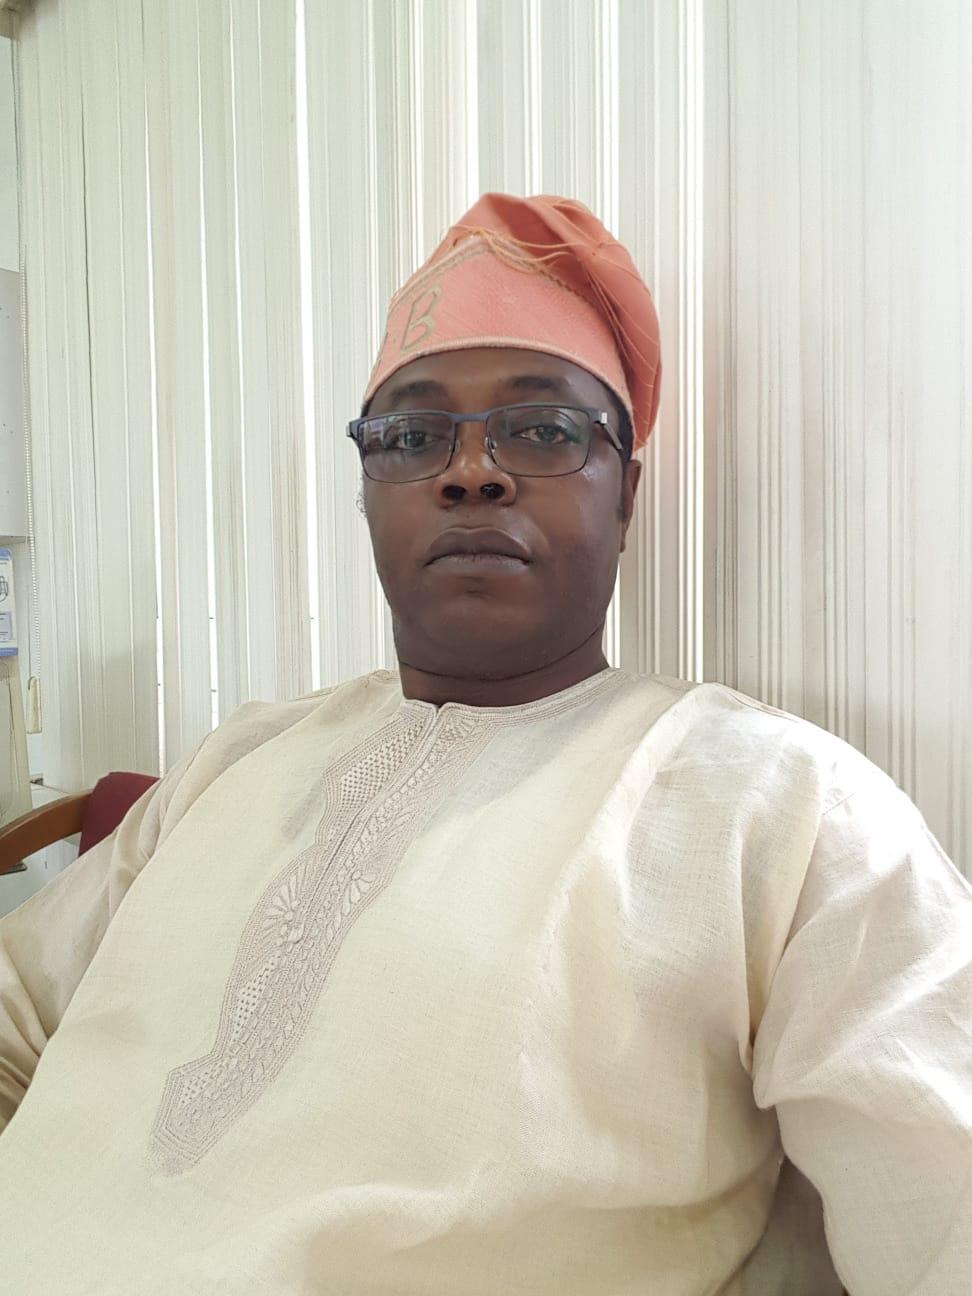 Mr. Oluwaseun Abimibola BAKARE B.Sc, M.Sc, FCA